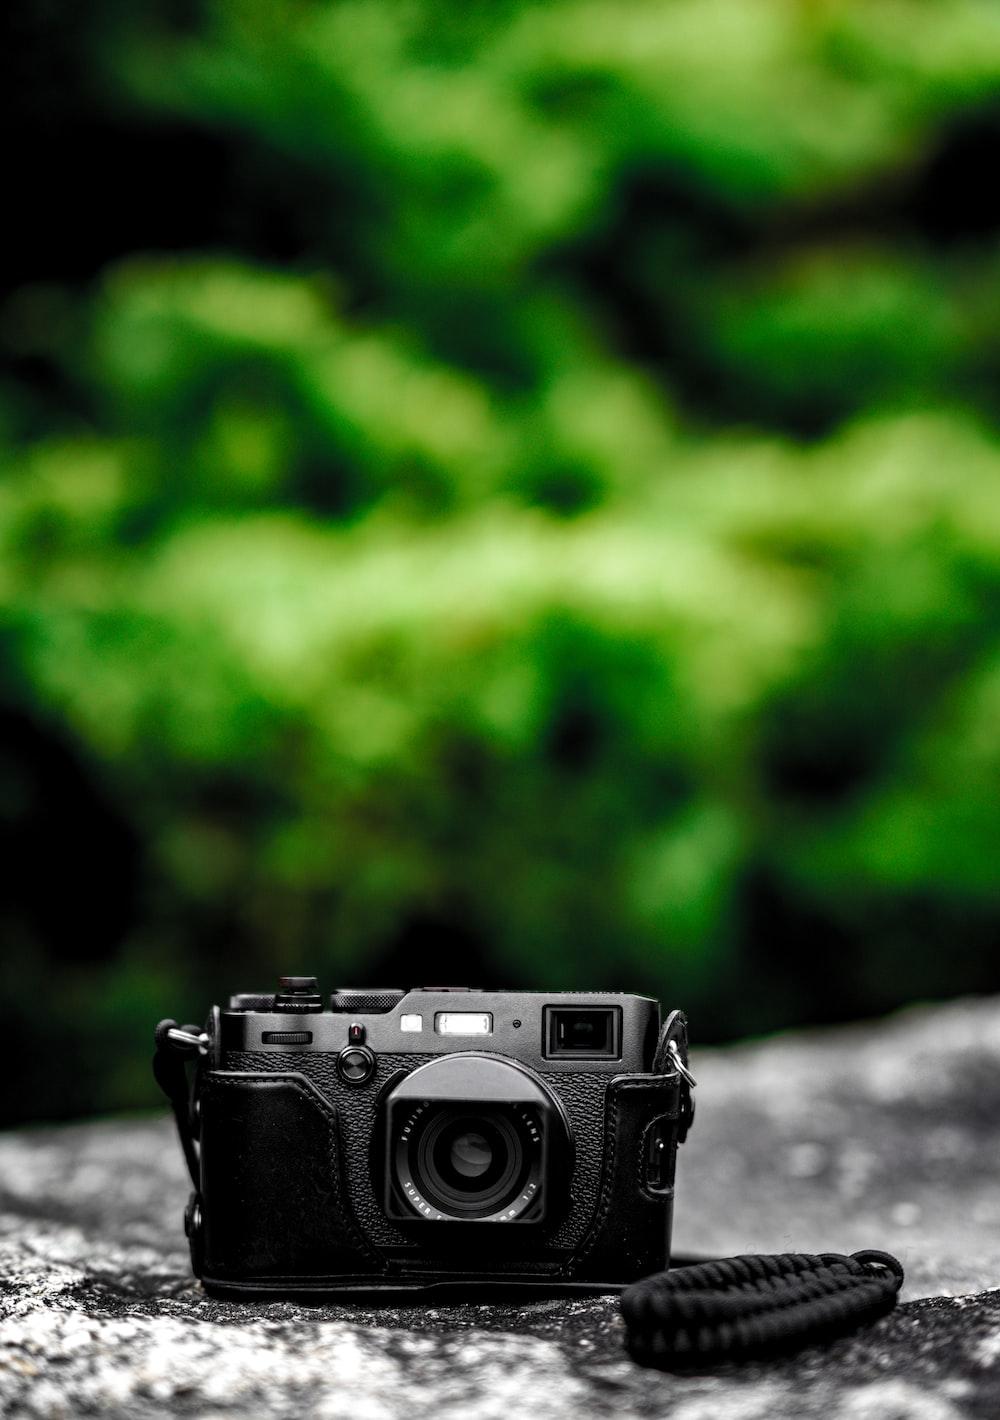 selective focus photo of bridge camera